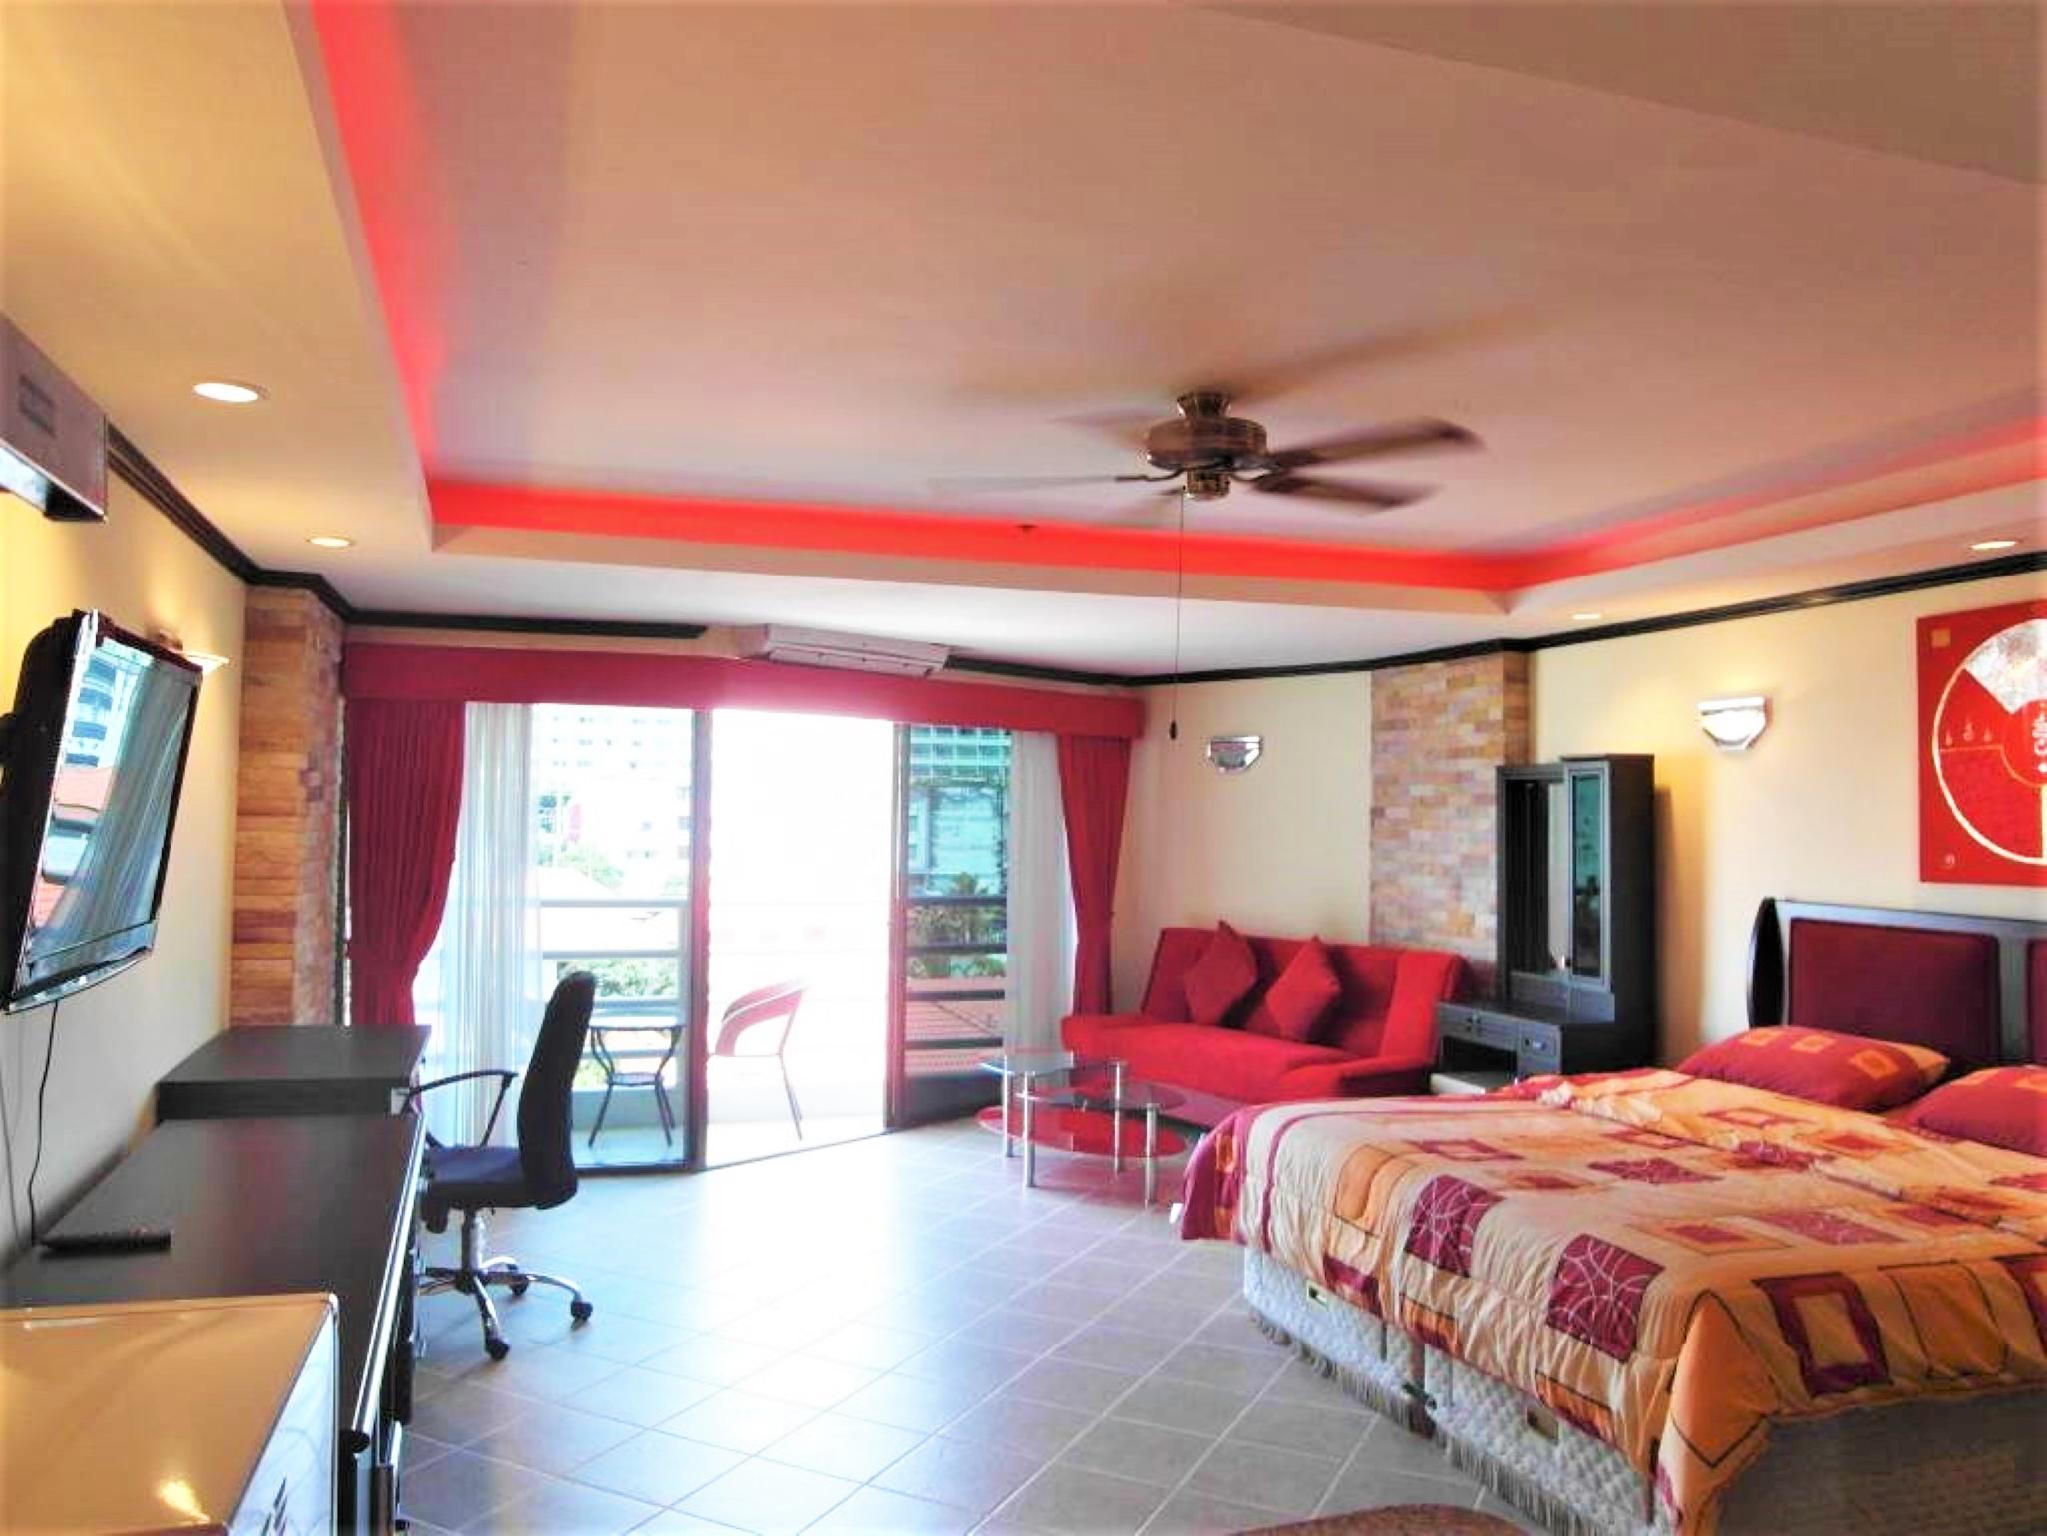 View Talay 2A floor 5 with European style kitchen สตูดิโอ อพาร์ตเมนต์ 1 ห้องน้ำส่วนตัว ขนาด 38 ตร.ม. – หาดดงตาล